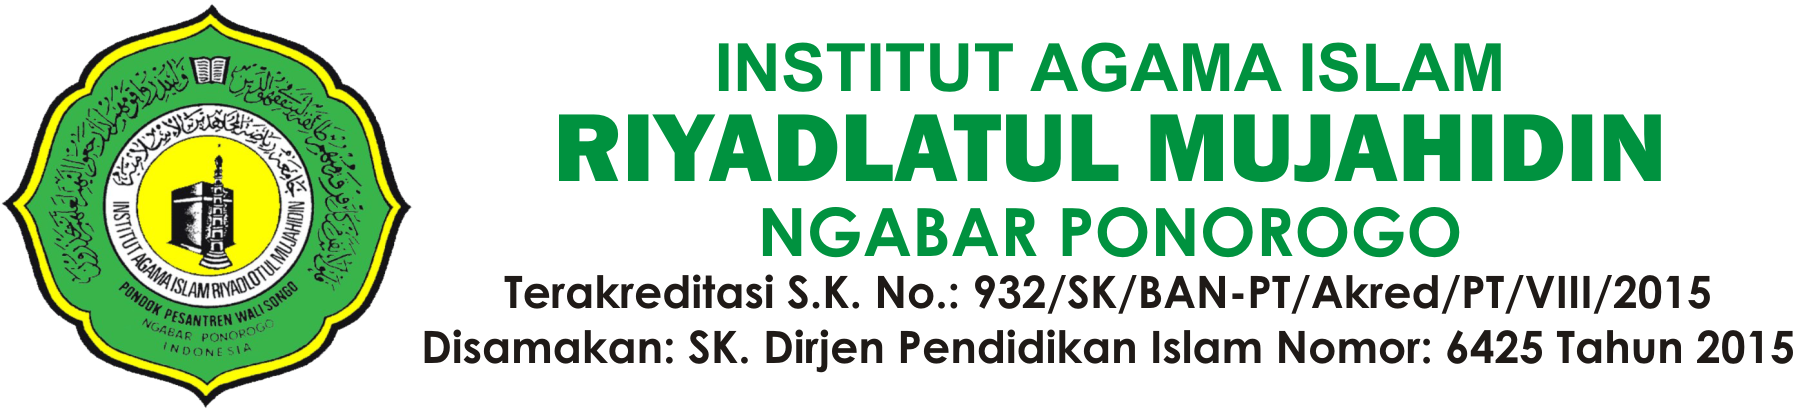 Institut Agama Islam Riyadlatul Mujahidin (IAIRM Ngabar)